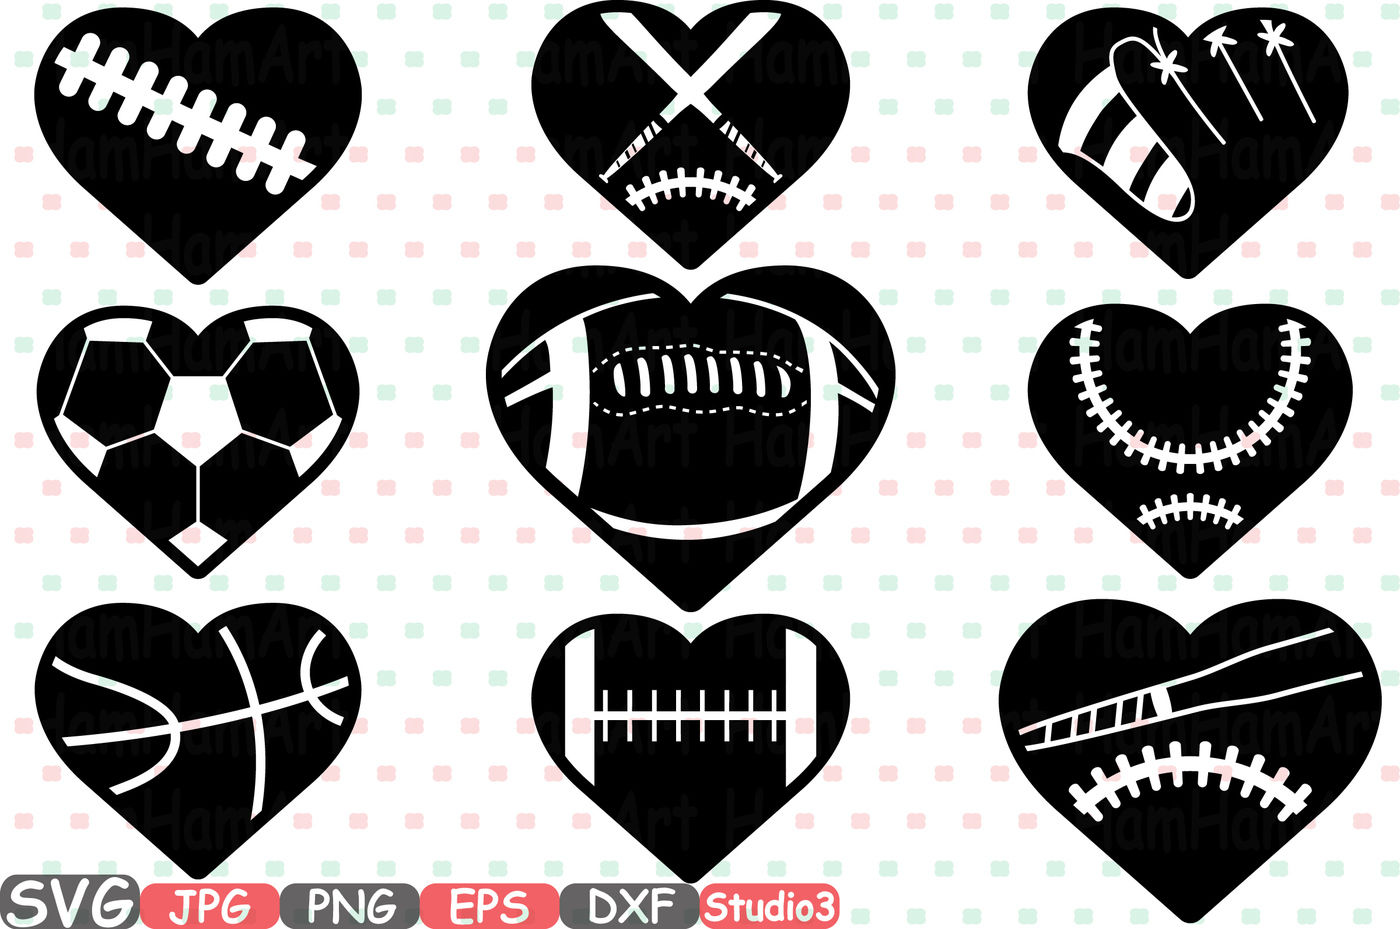 Sports Heart Balls Silhouette Svg Cutting Files Digital Clip Art Graphic Studio3 Cricut Cuttable Die Cut Machines Love Ball Baseball Soccer Basketball Football Valentines 700s By Hamhamart Thehungryjpeg Com